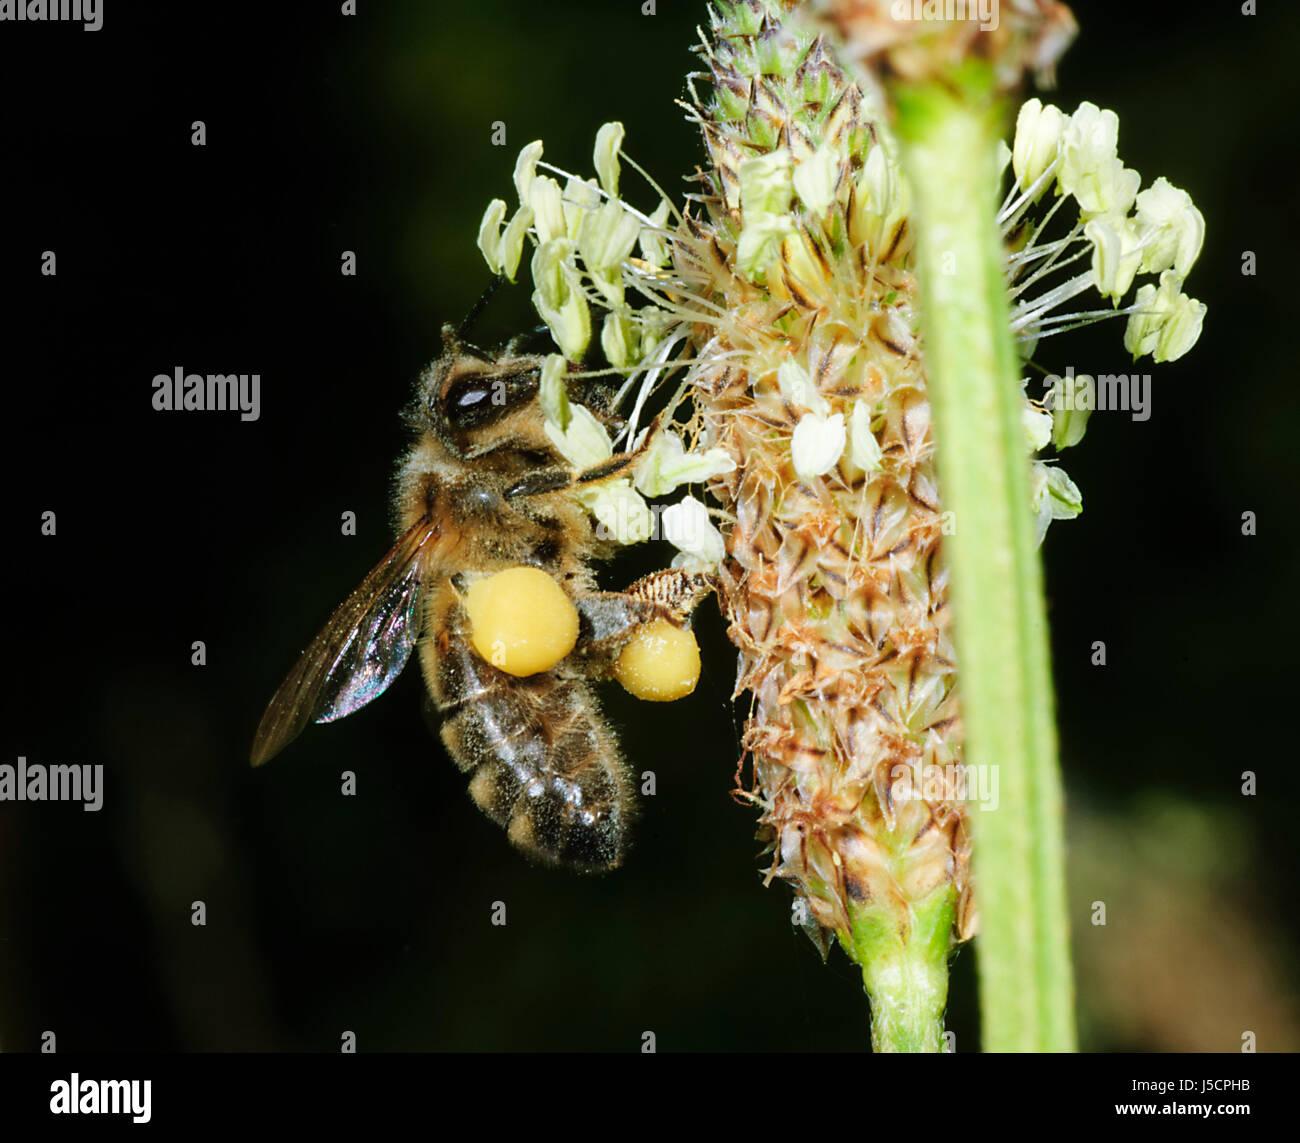 Honey bee (Apis mellifera) with pollen sacs, New South Wales, NSW, Australia - Stock Image